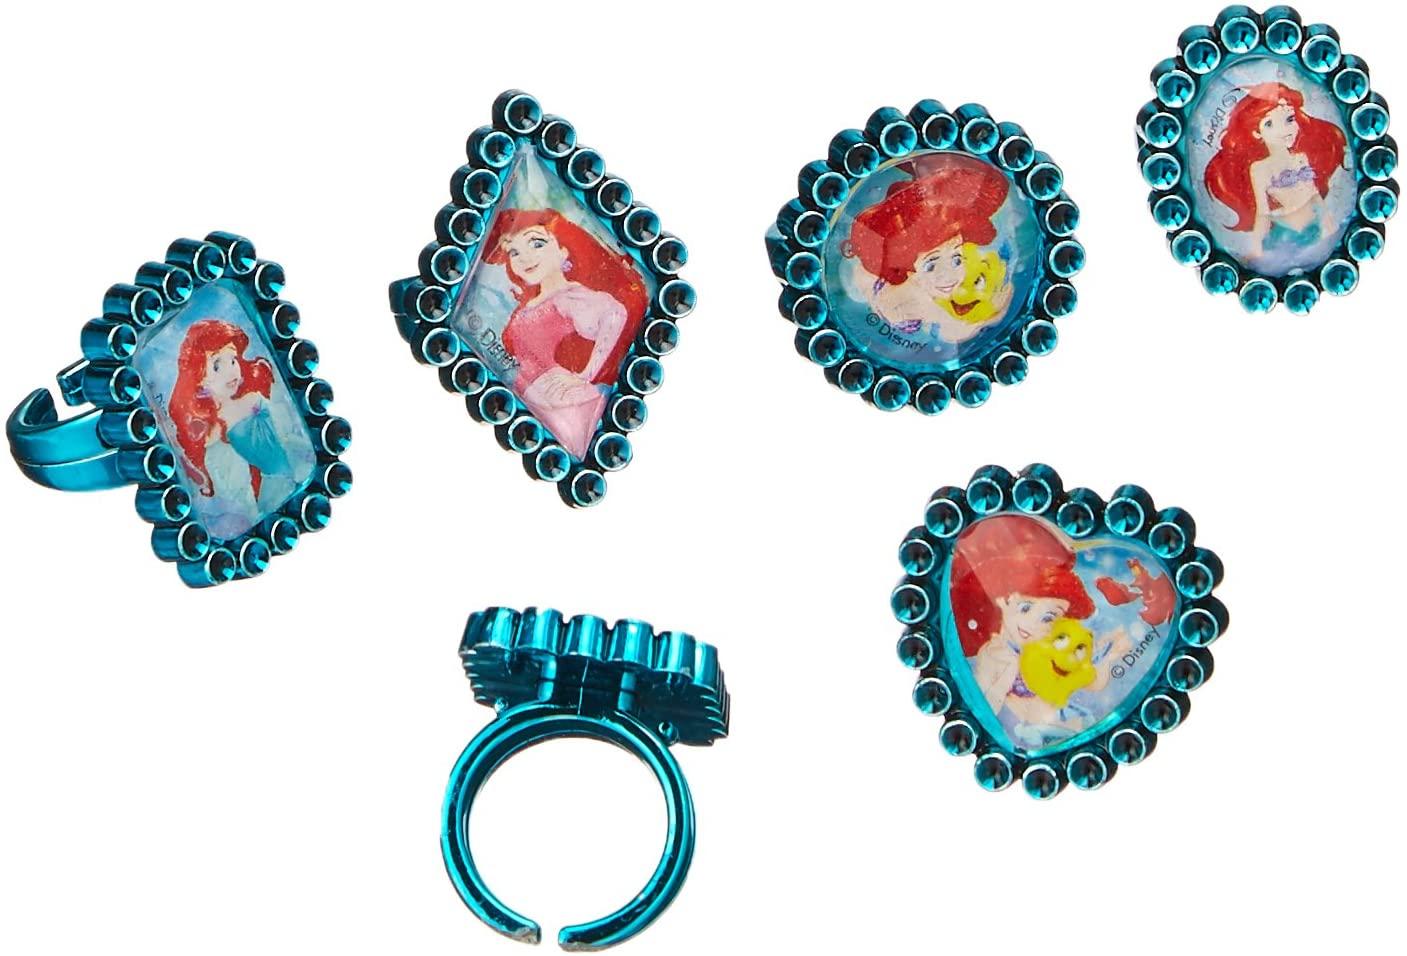 Amscan Enchanting Disney Ariel Dream Big Birthday Jewel Rings Party Favor, Green, 1